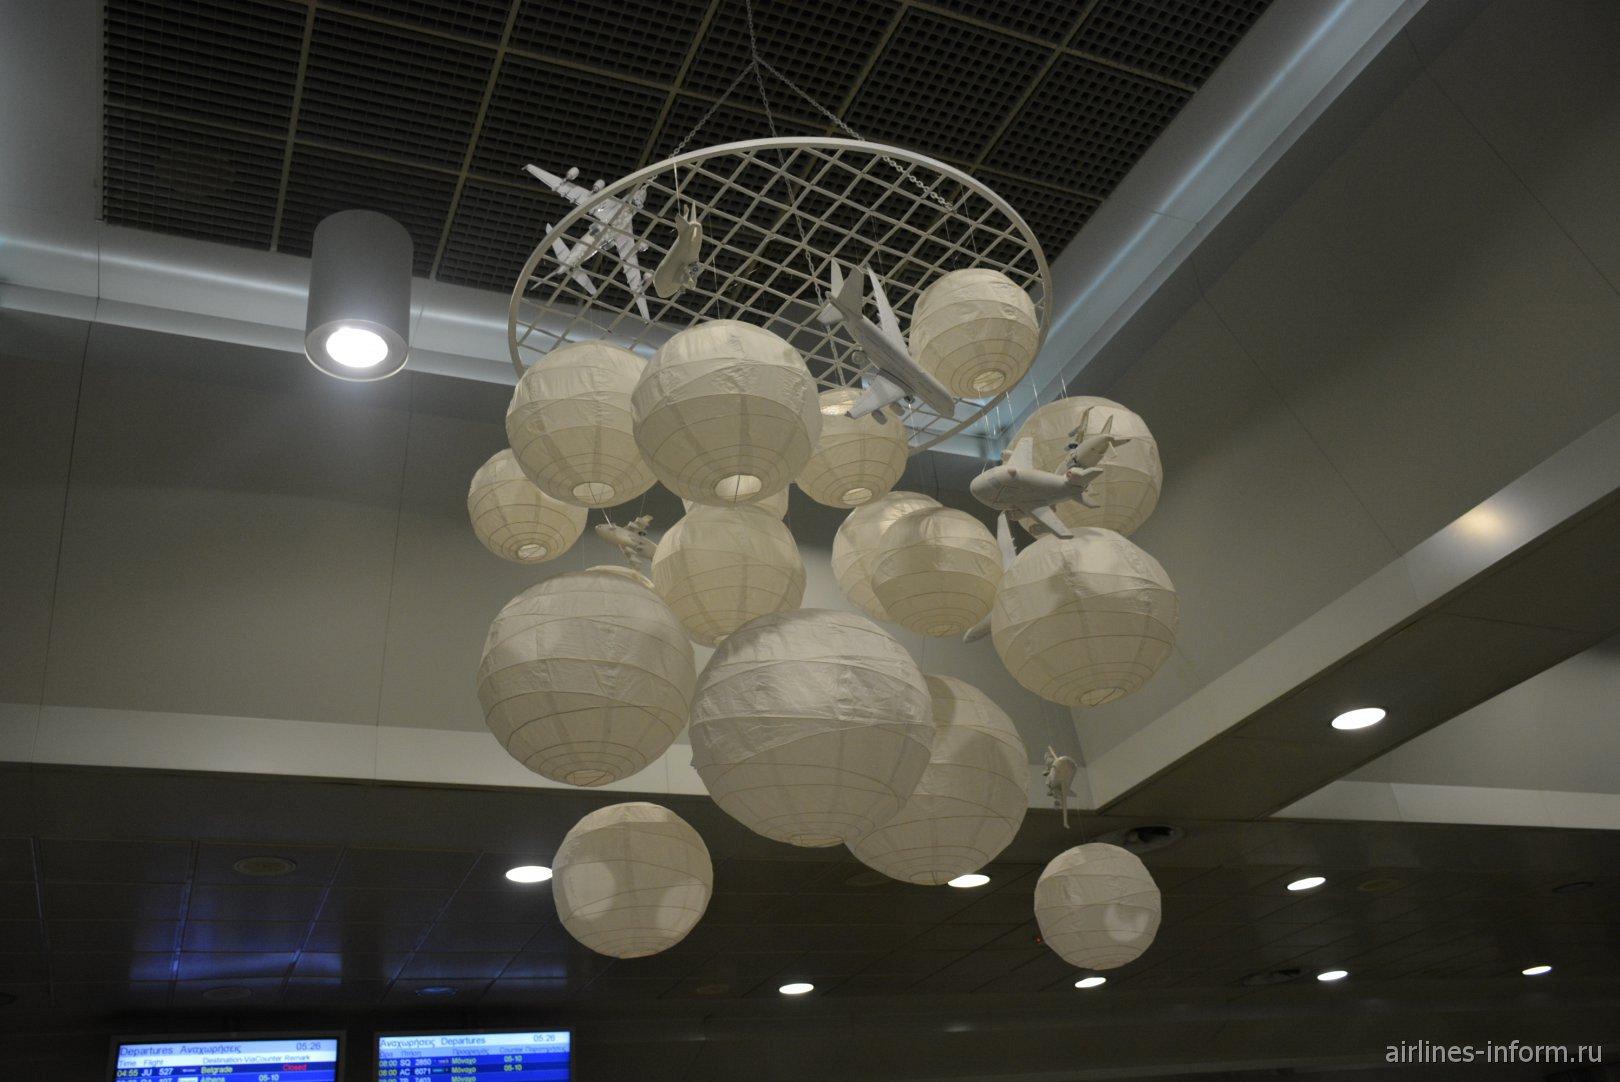 Инсталляция в аэропорту Салоники Македония